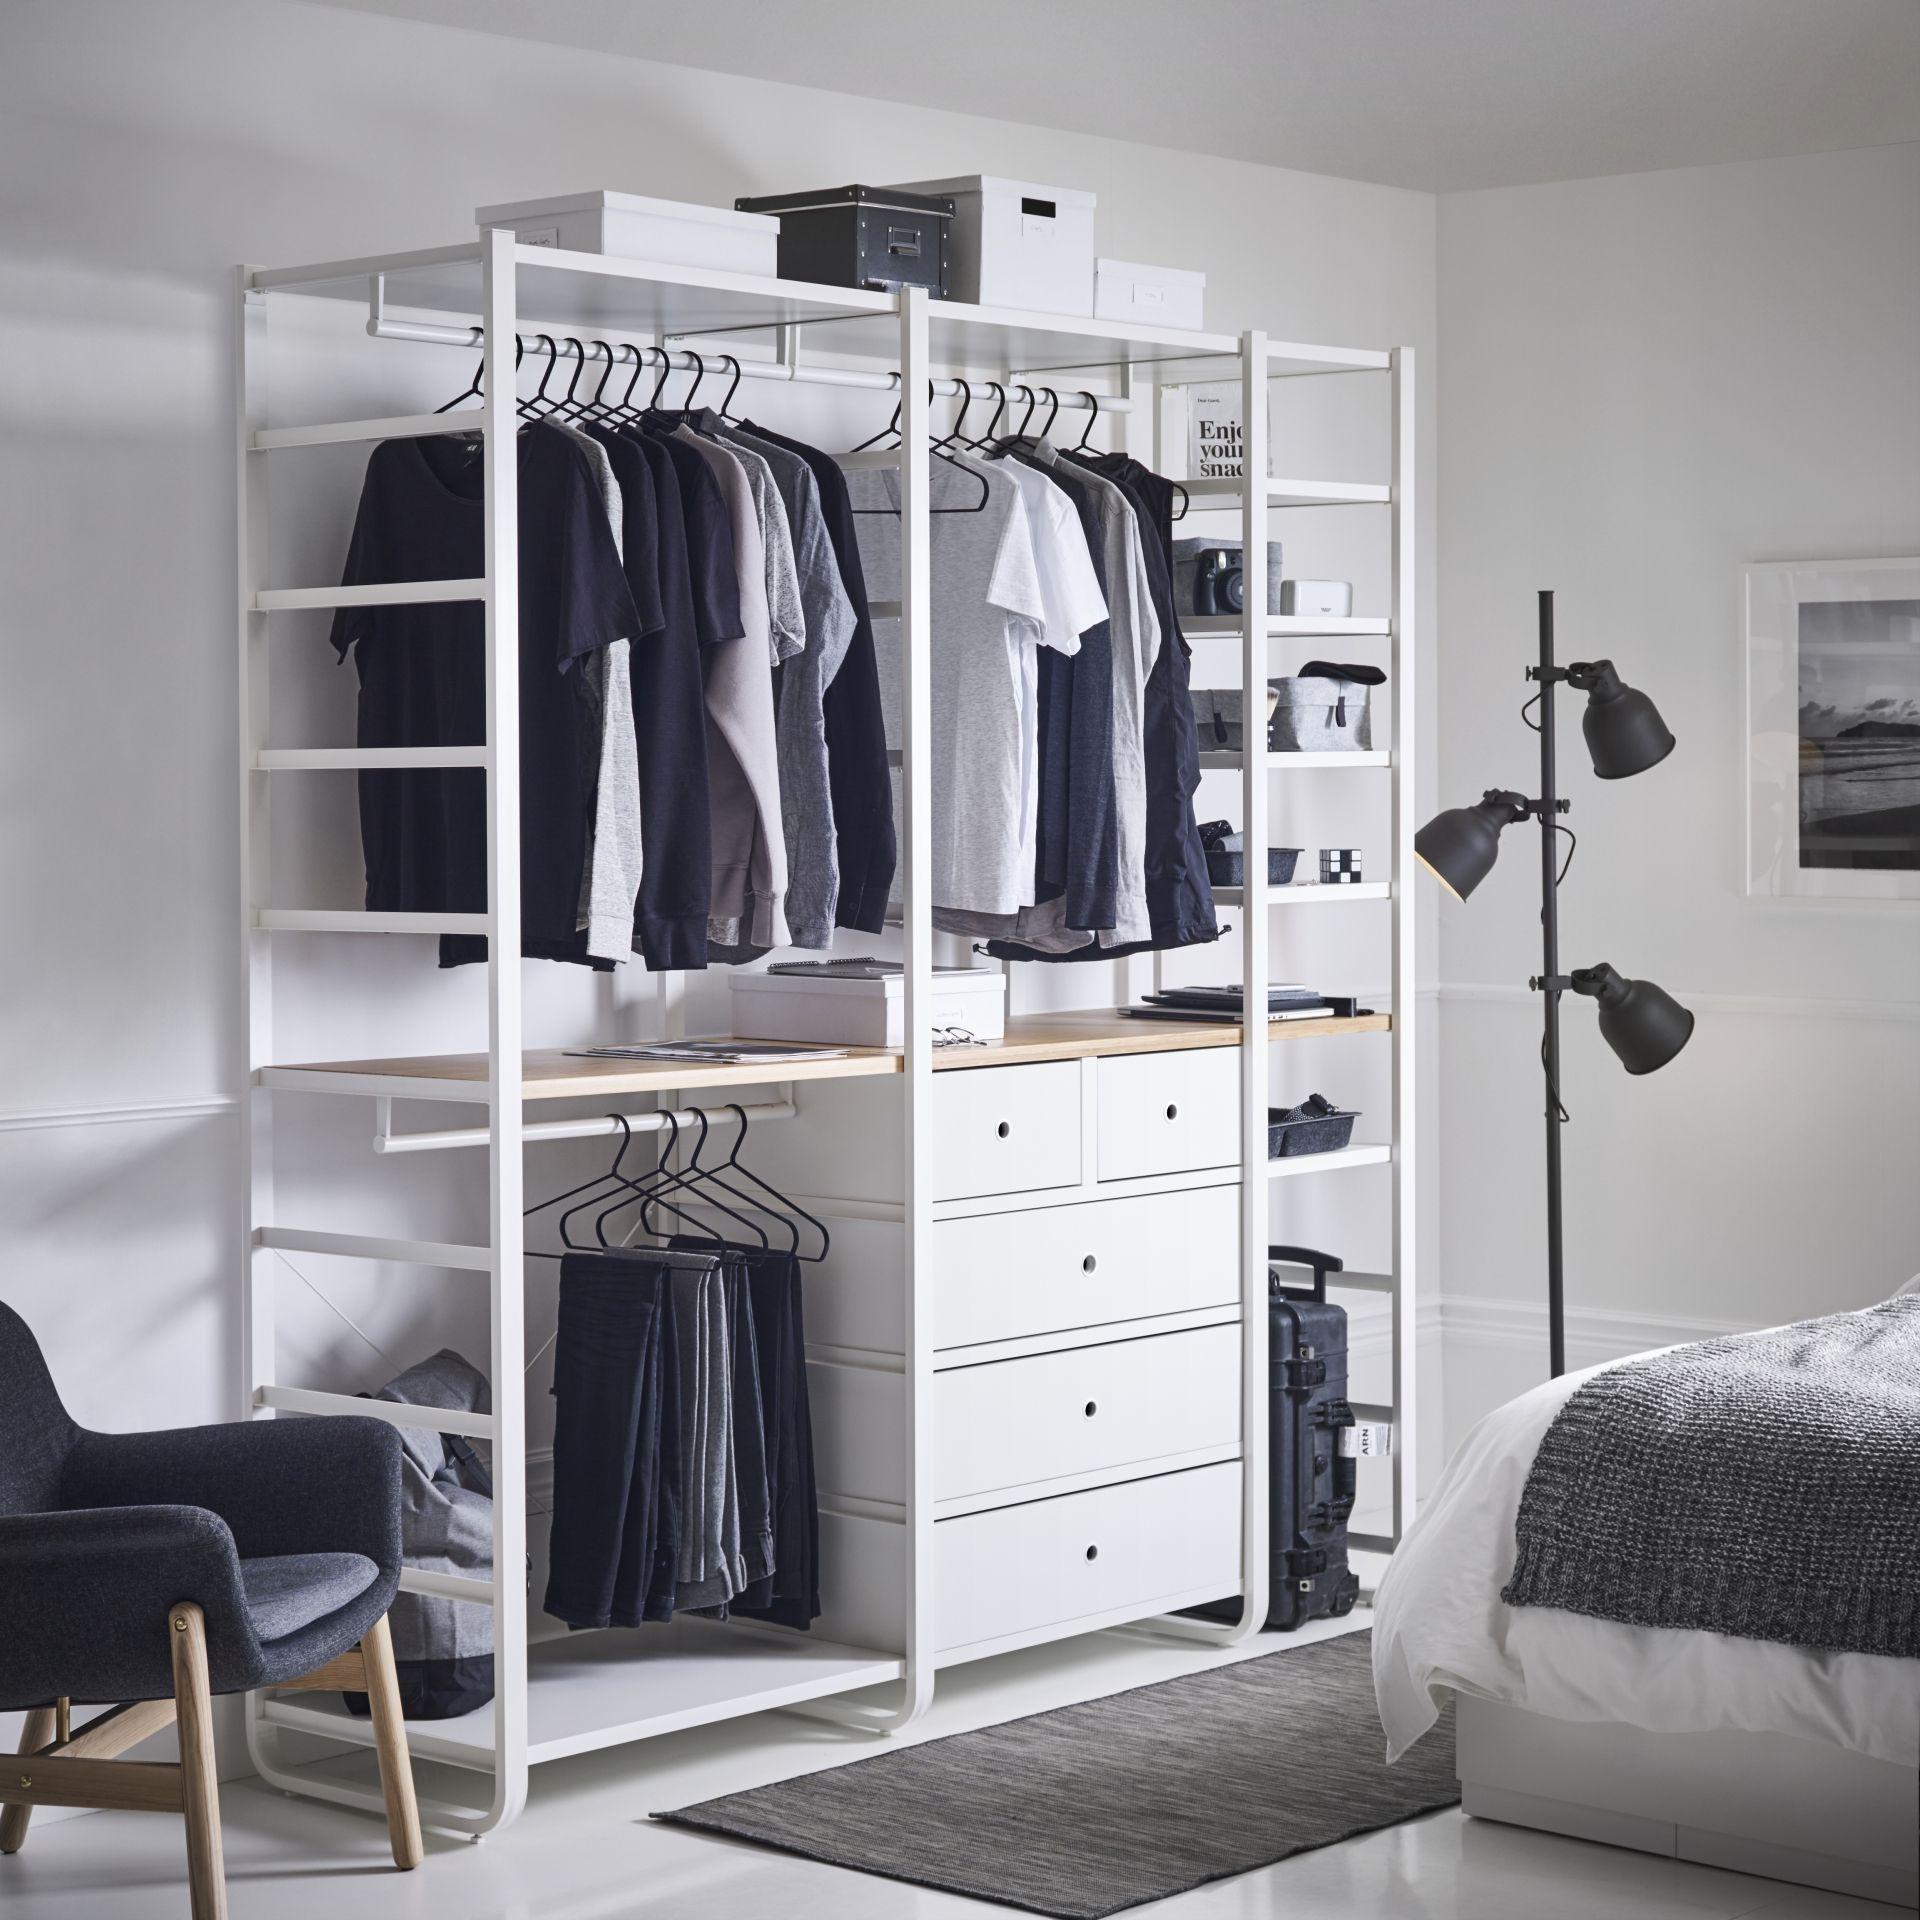 ELVARLI combinatie  IKEA IKEAnl IKEAnederland kast